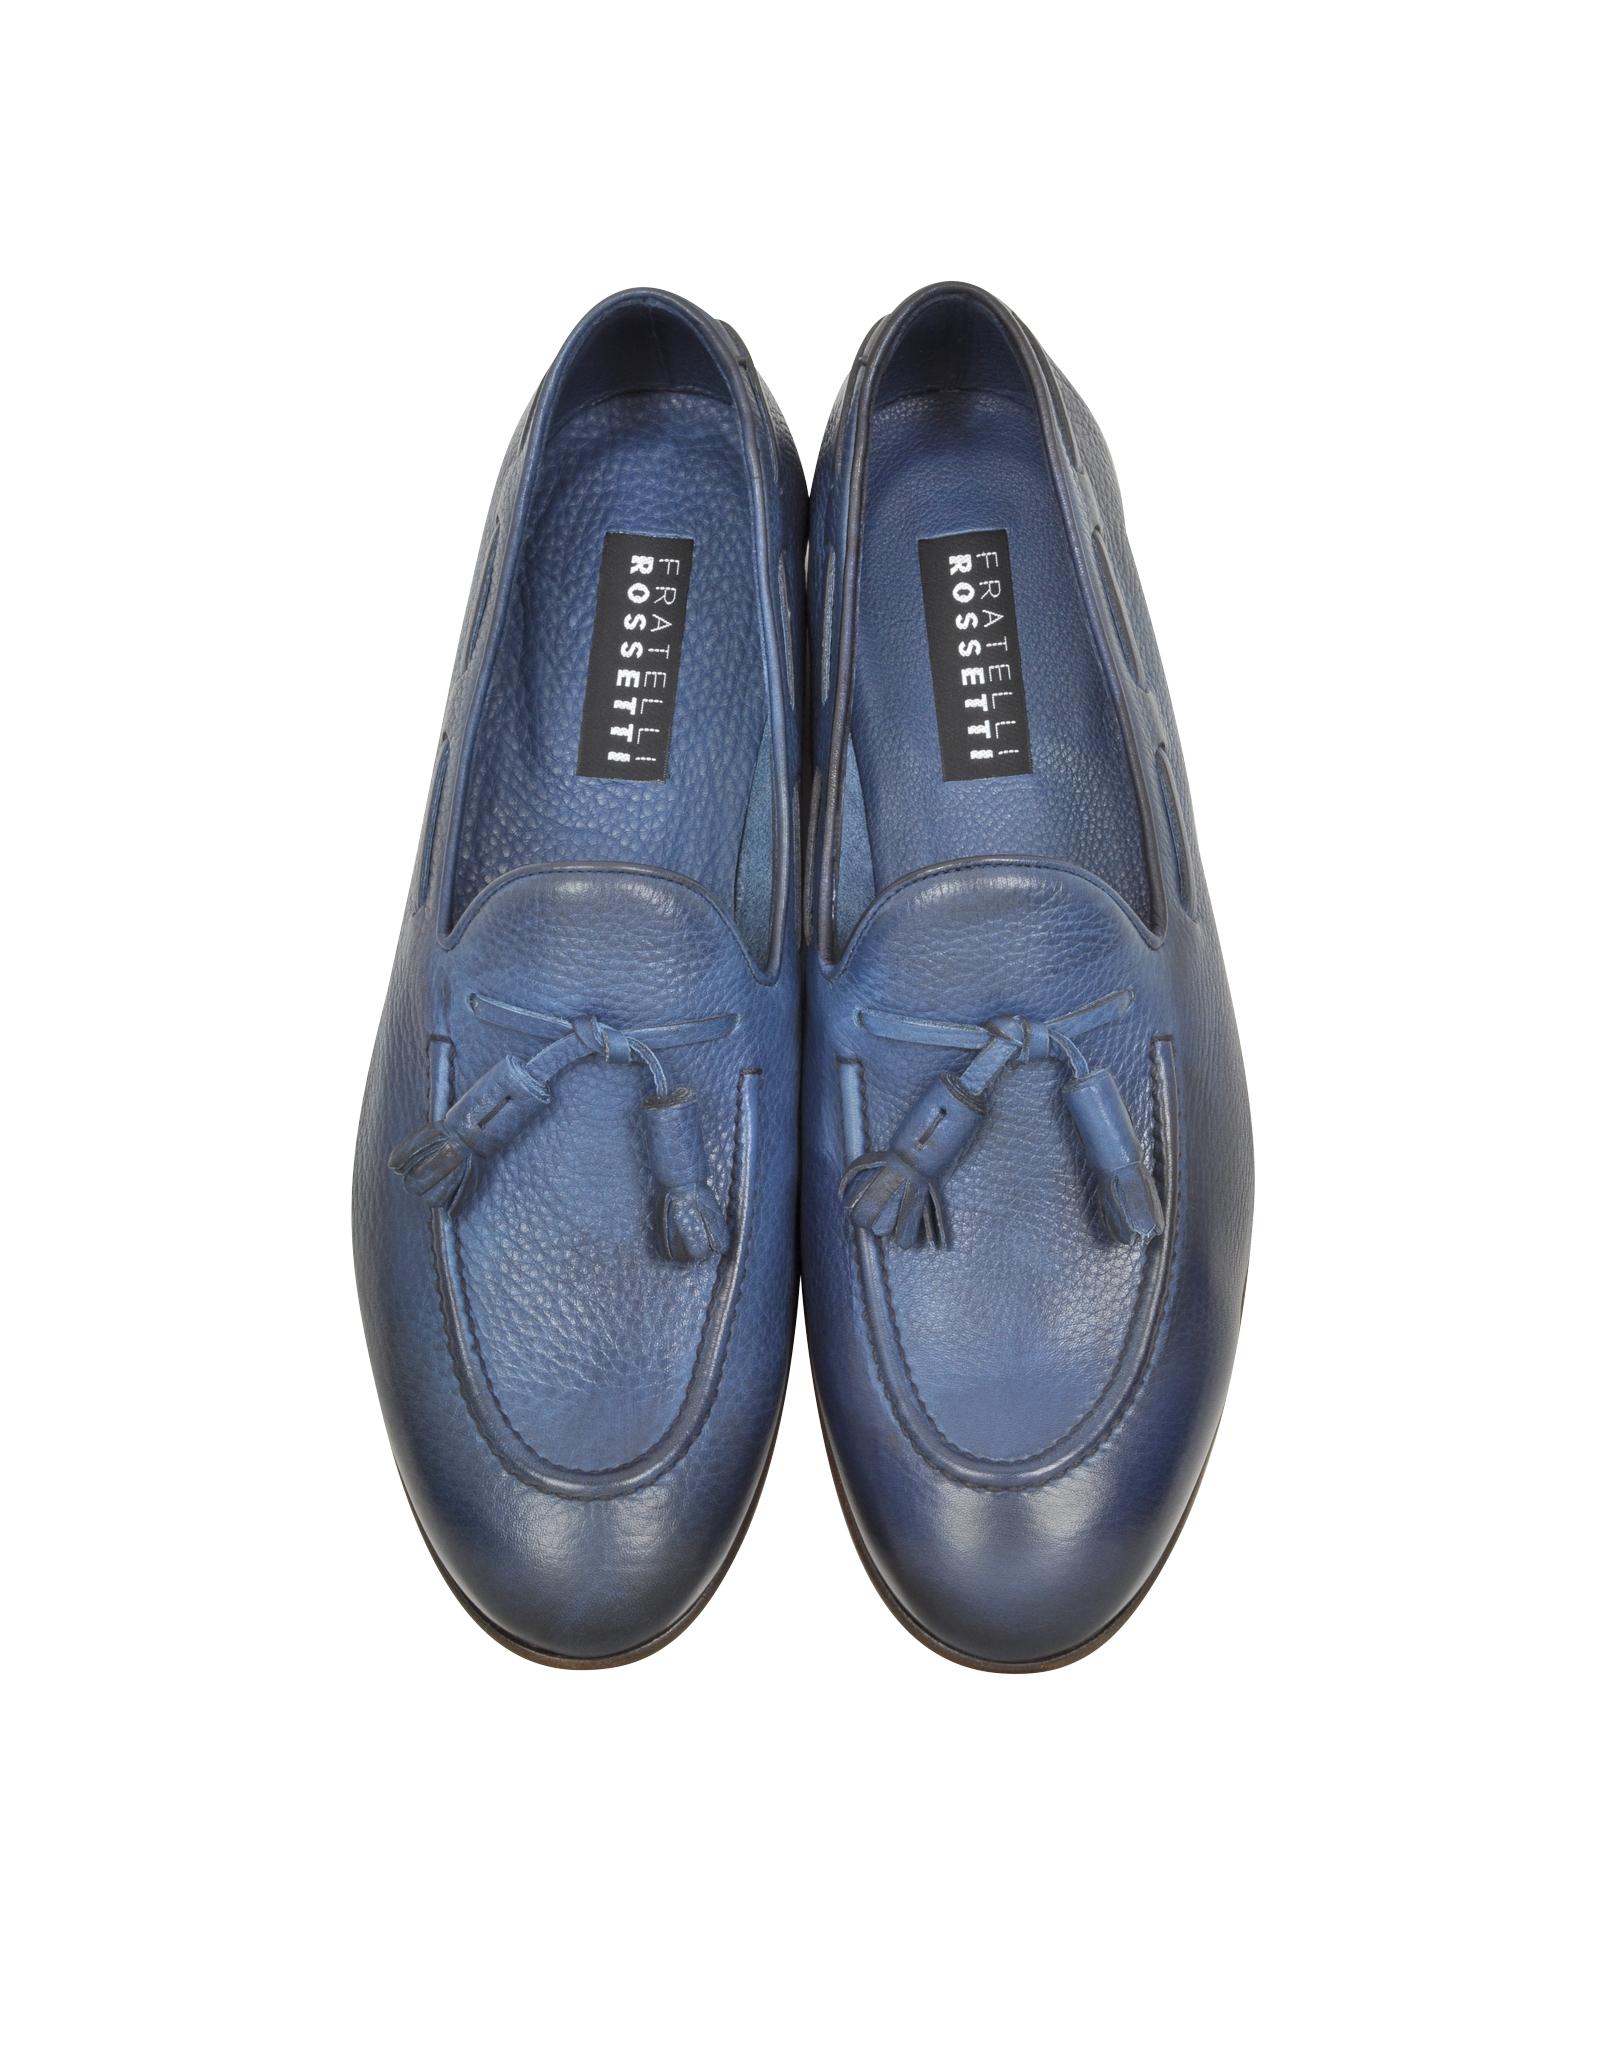 tassel boat shoes - Blue Fratelli Rossetti HOhCb1cHwx